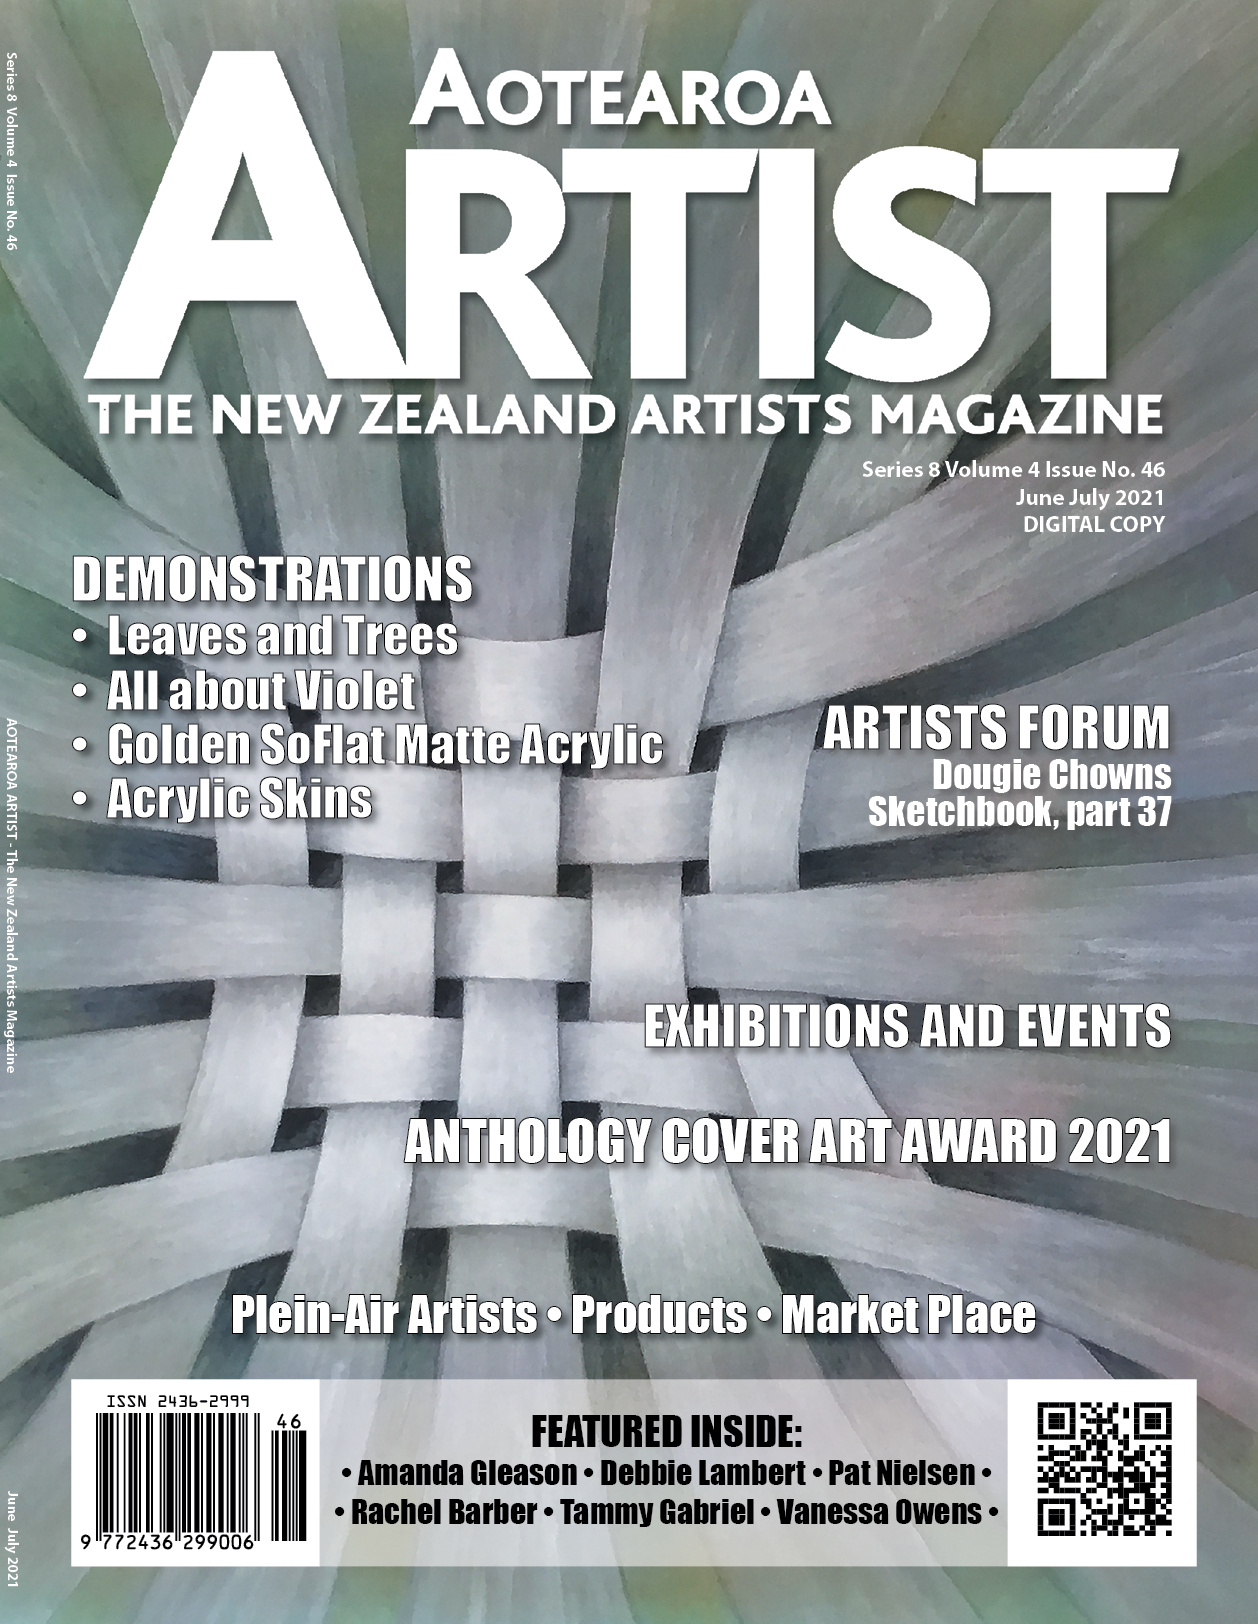 June/July 2021 – Volume 4 – Issue 46